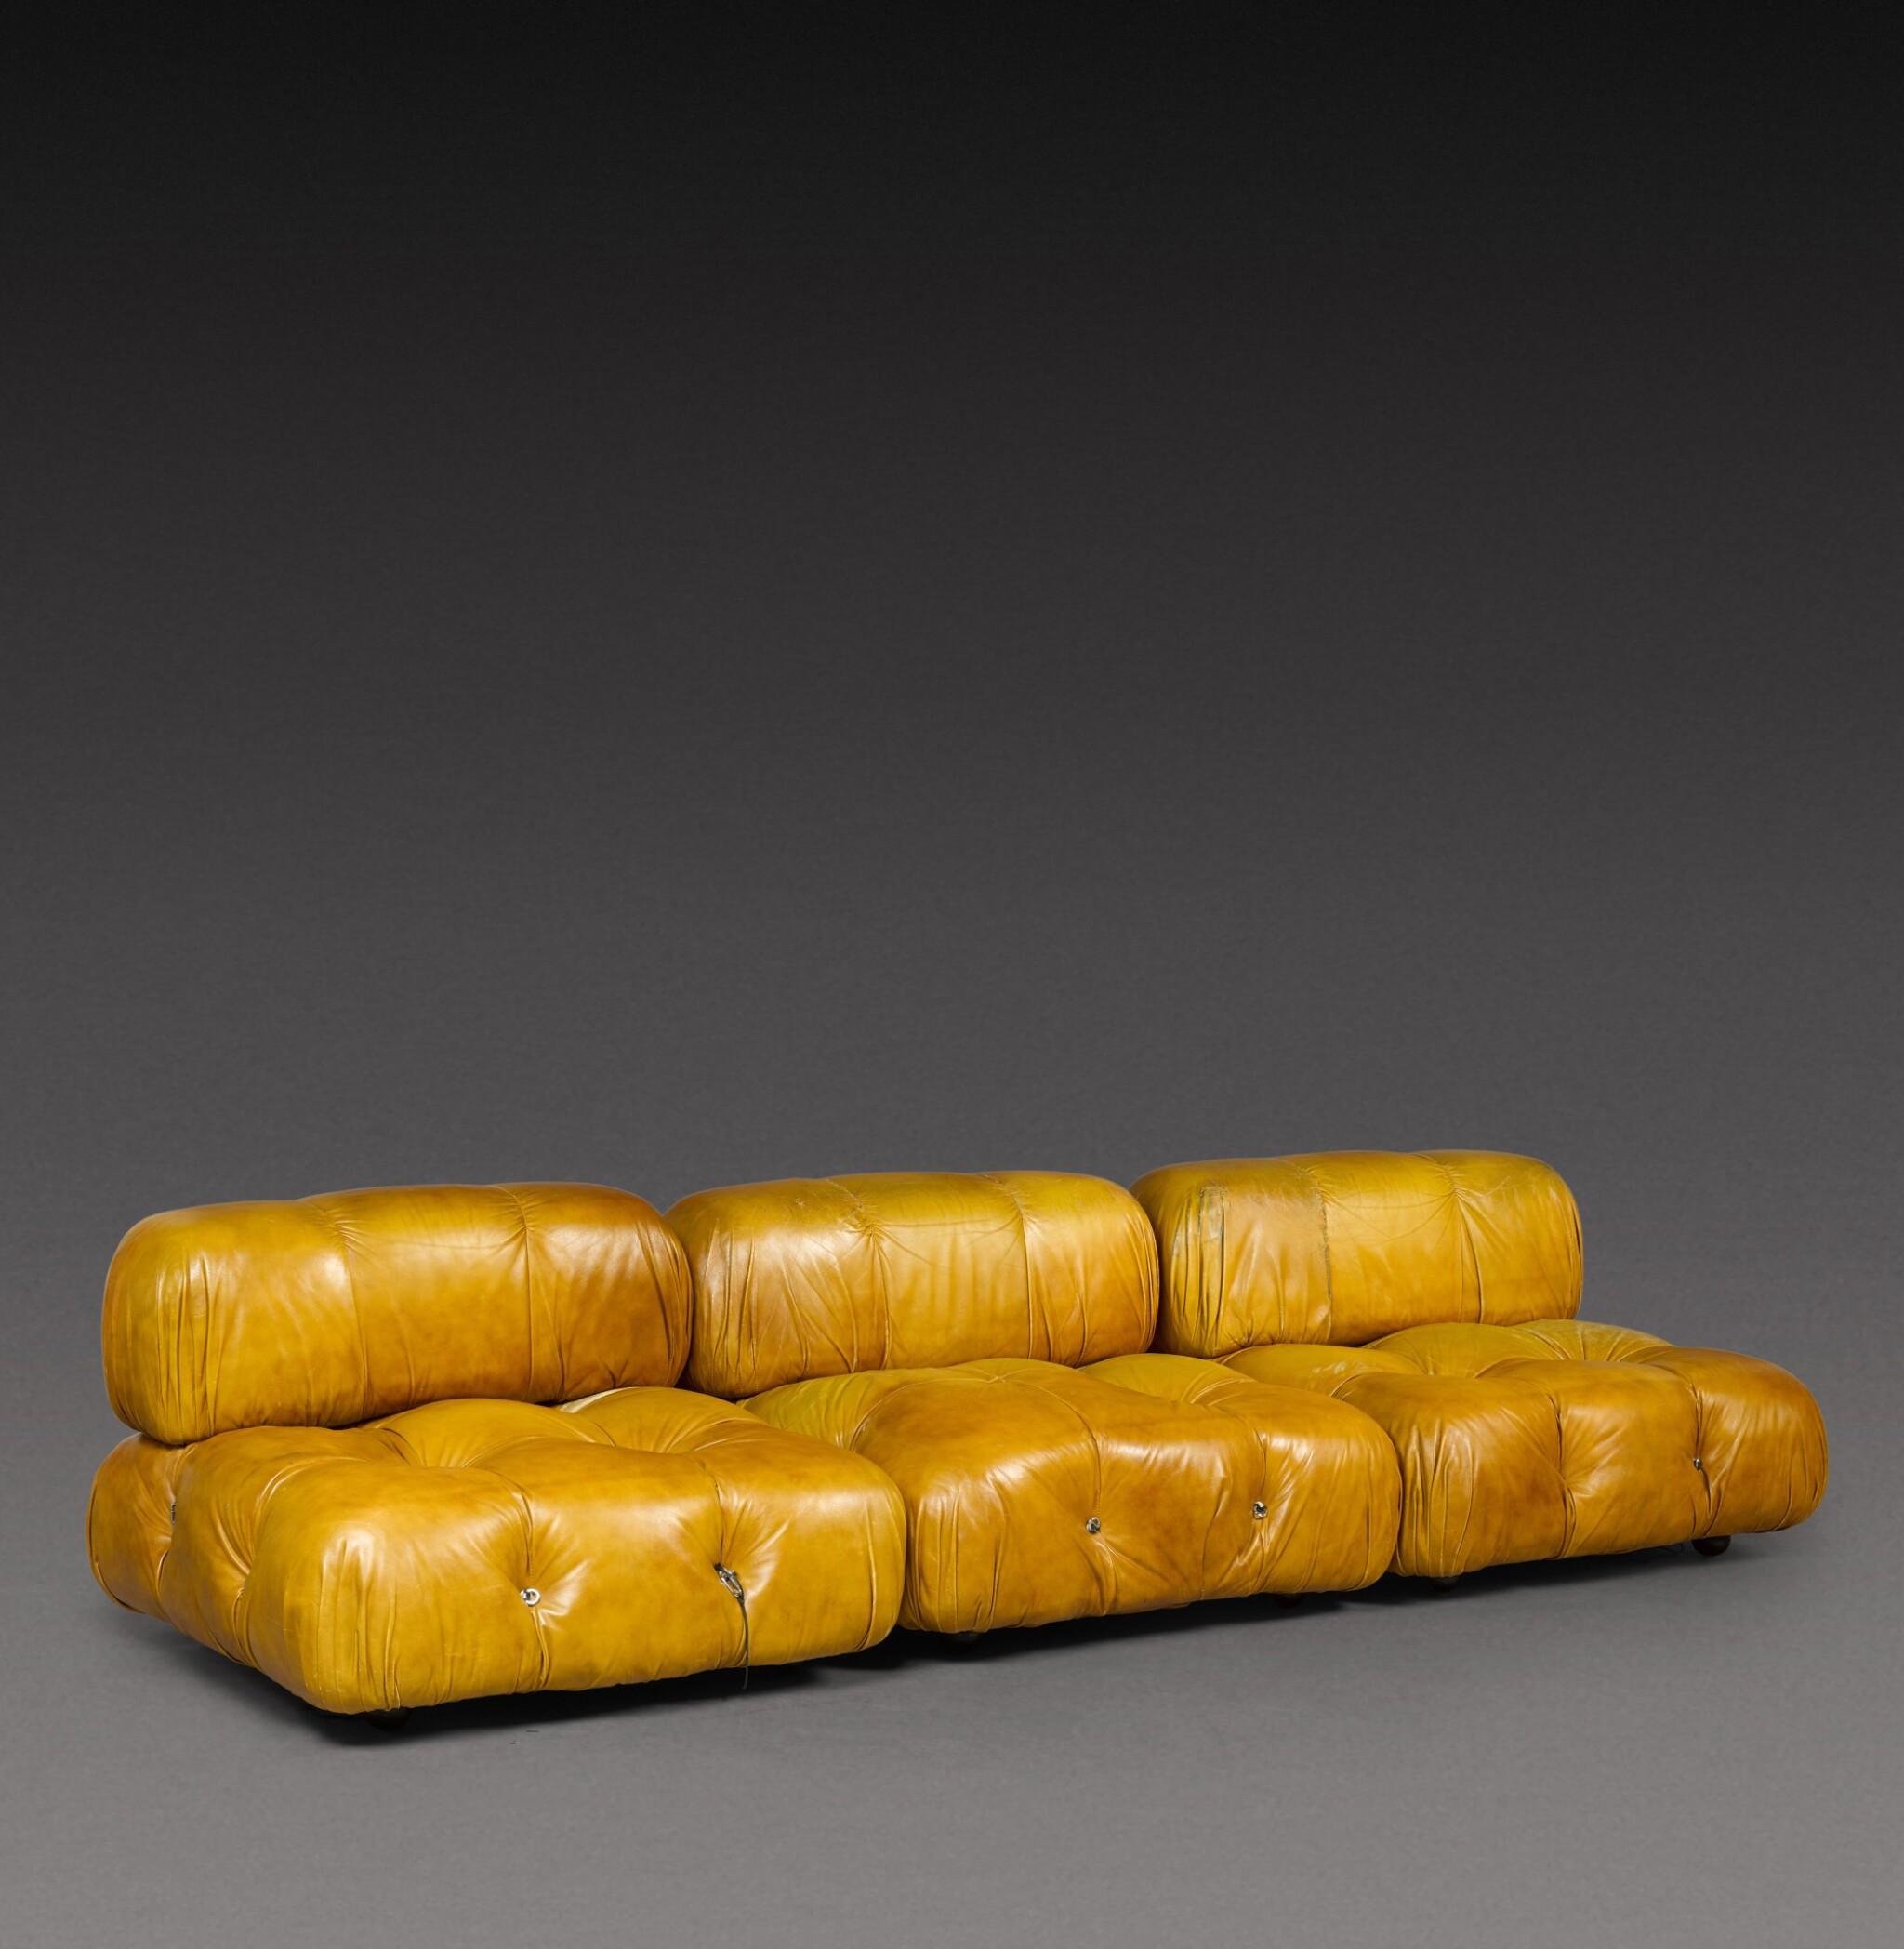 View 1 of Lot 185. Three piece Camaleonda sofa.